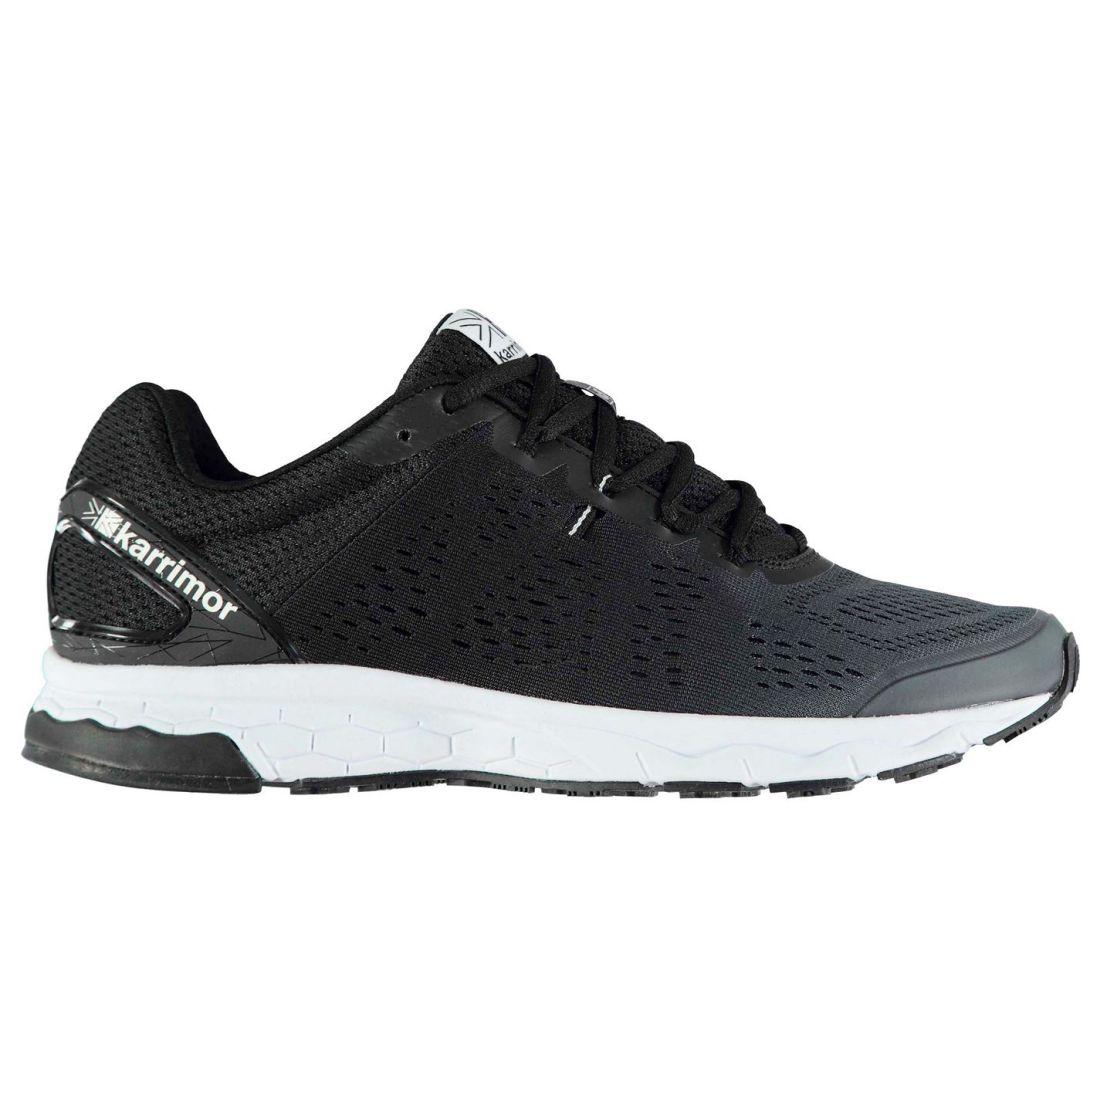 Karrimor Karrimor Karrimor Tempo 5 apoyo Road Running Zapatos Damas corrojoores Cordones atados Malla  Ven a elegir tu propio estilo deportivo.